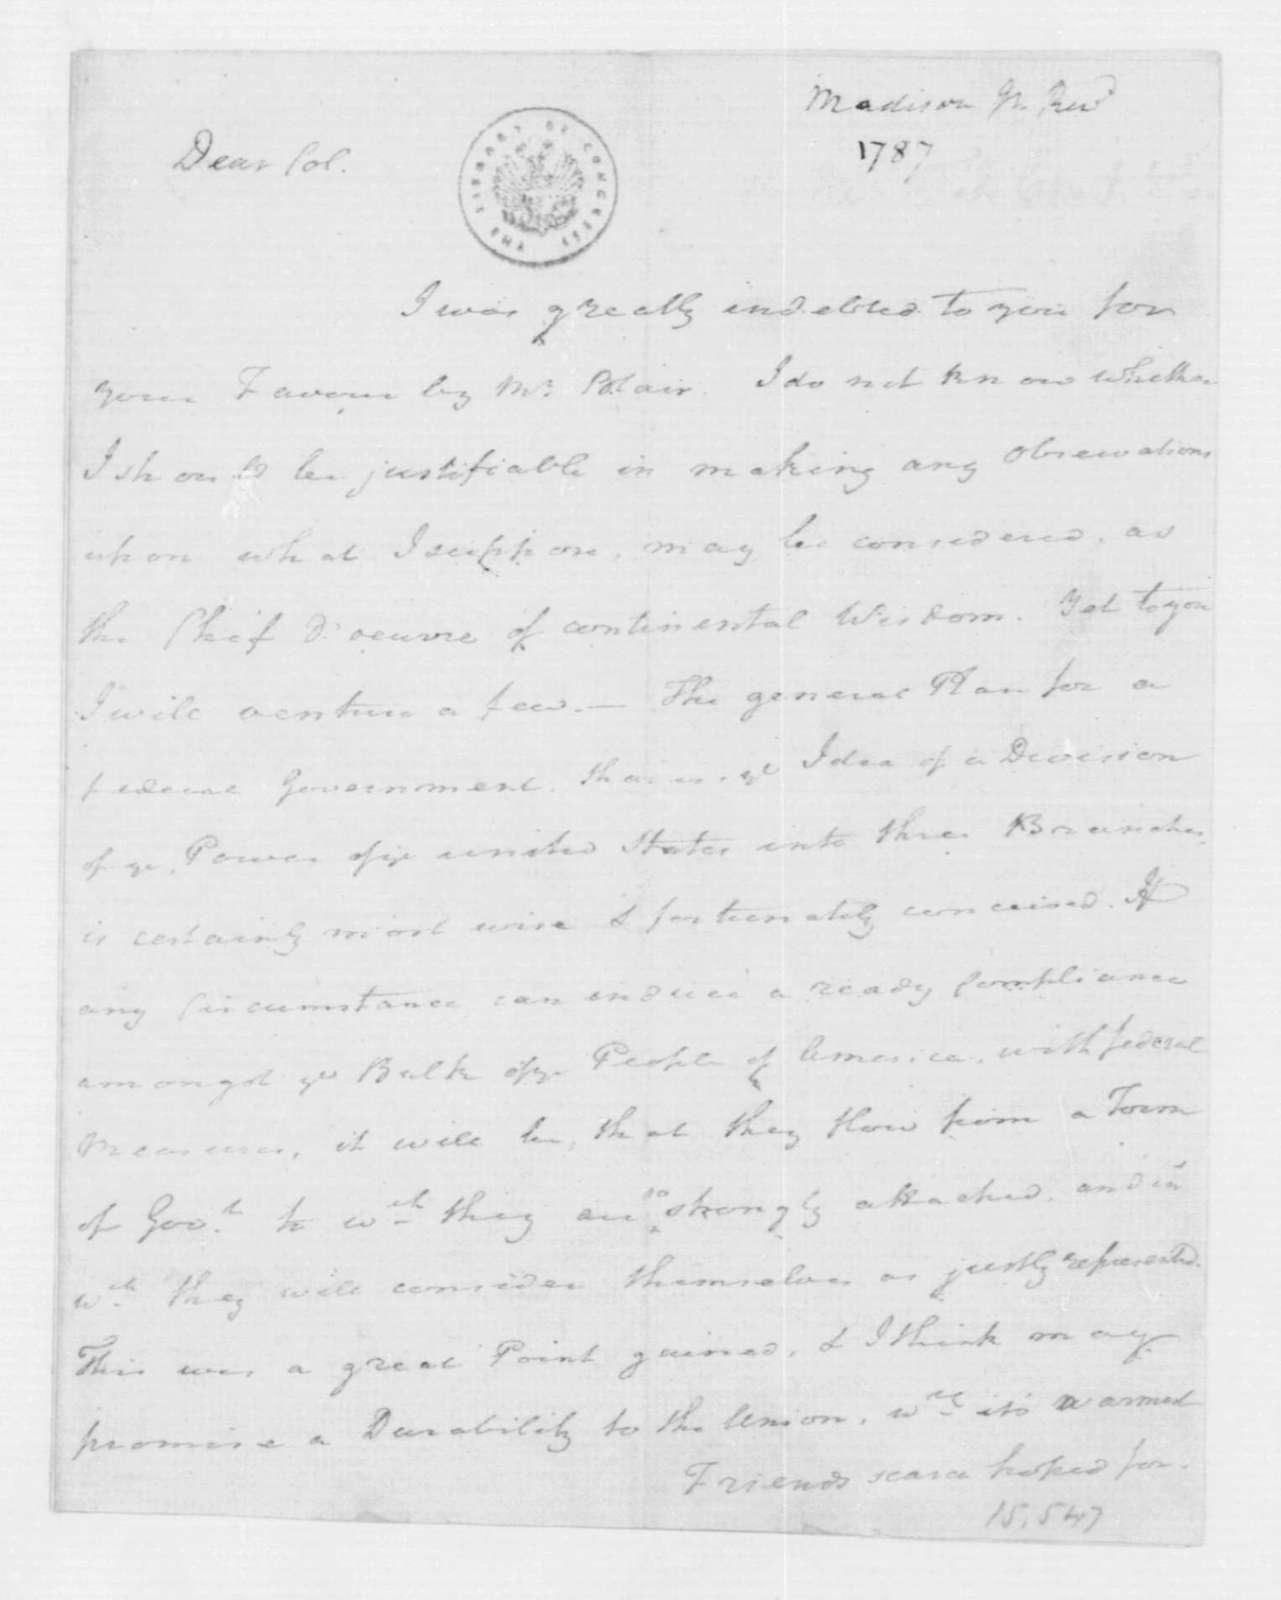 Rev. James Madison to James Madison. October 1, 1781.